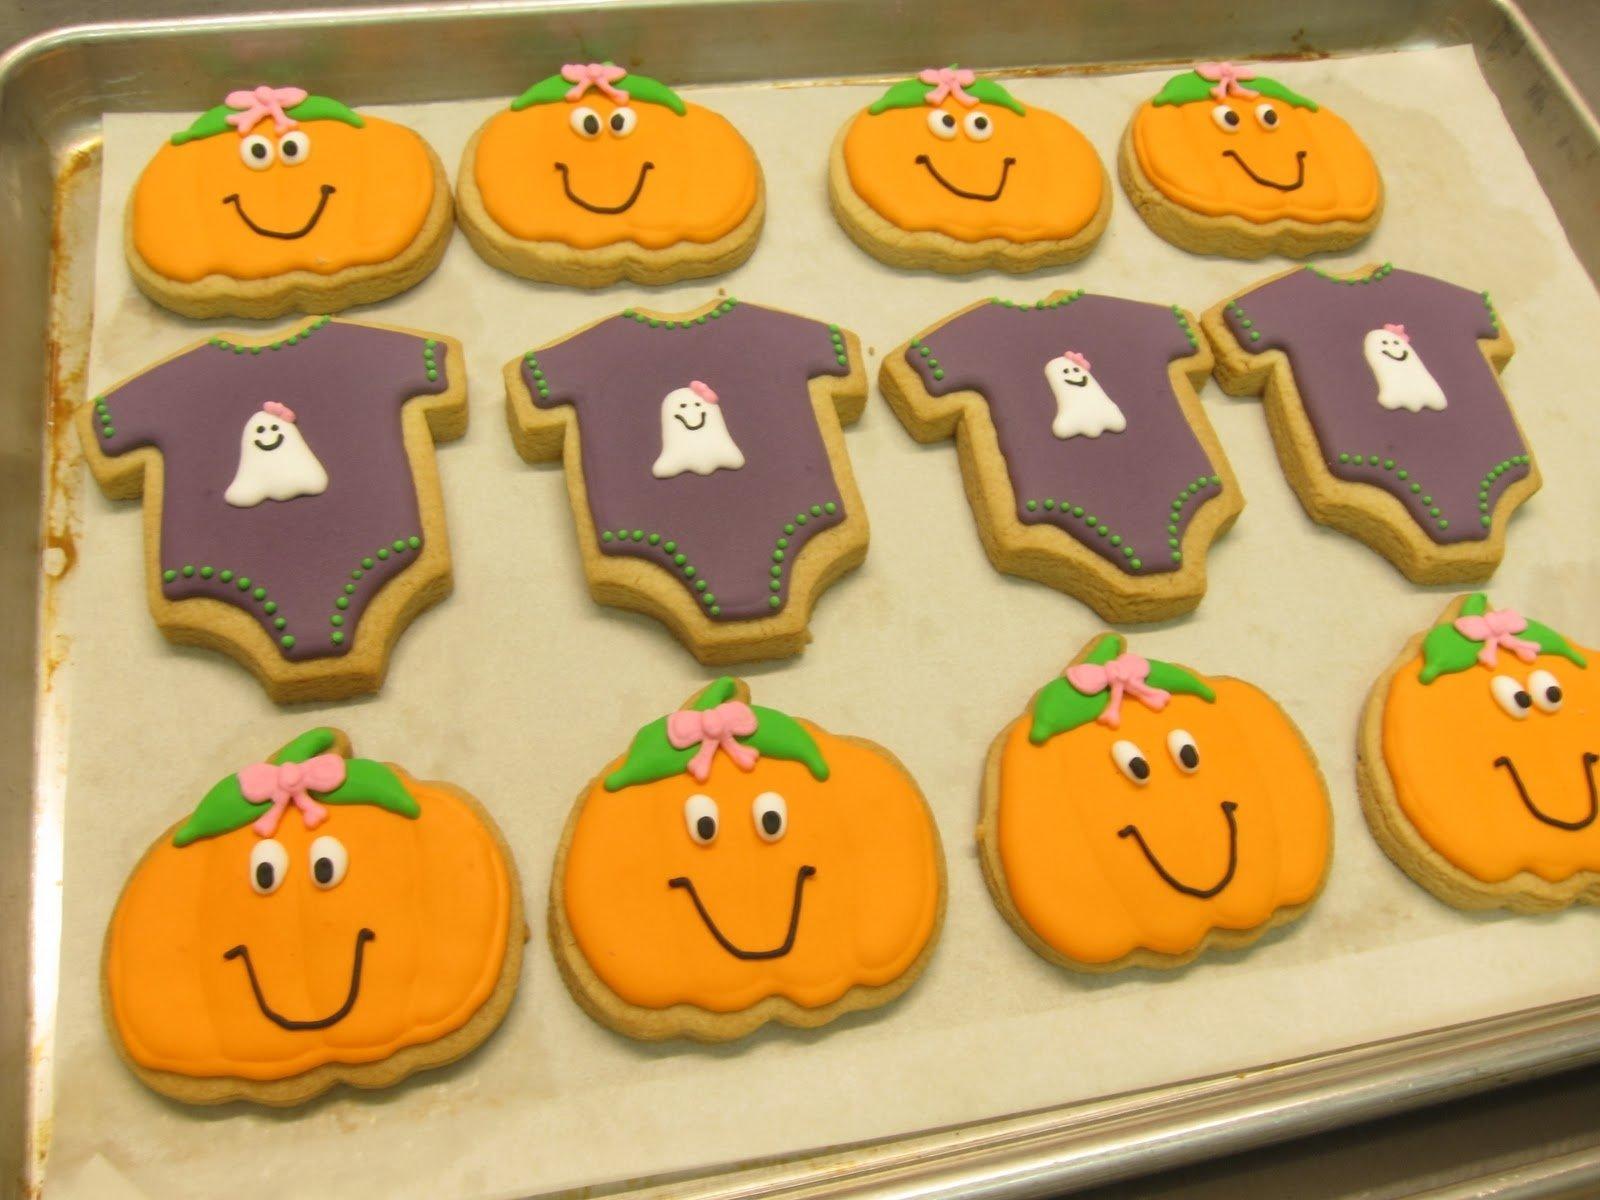 10 Fantastic Halloween Themed Baby Shower Ideas photo homemade halloween baby shower image 2020